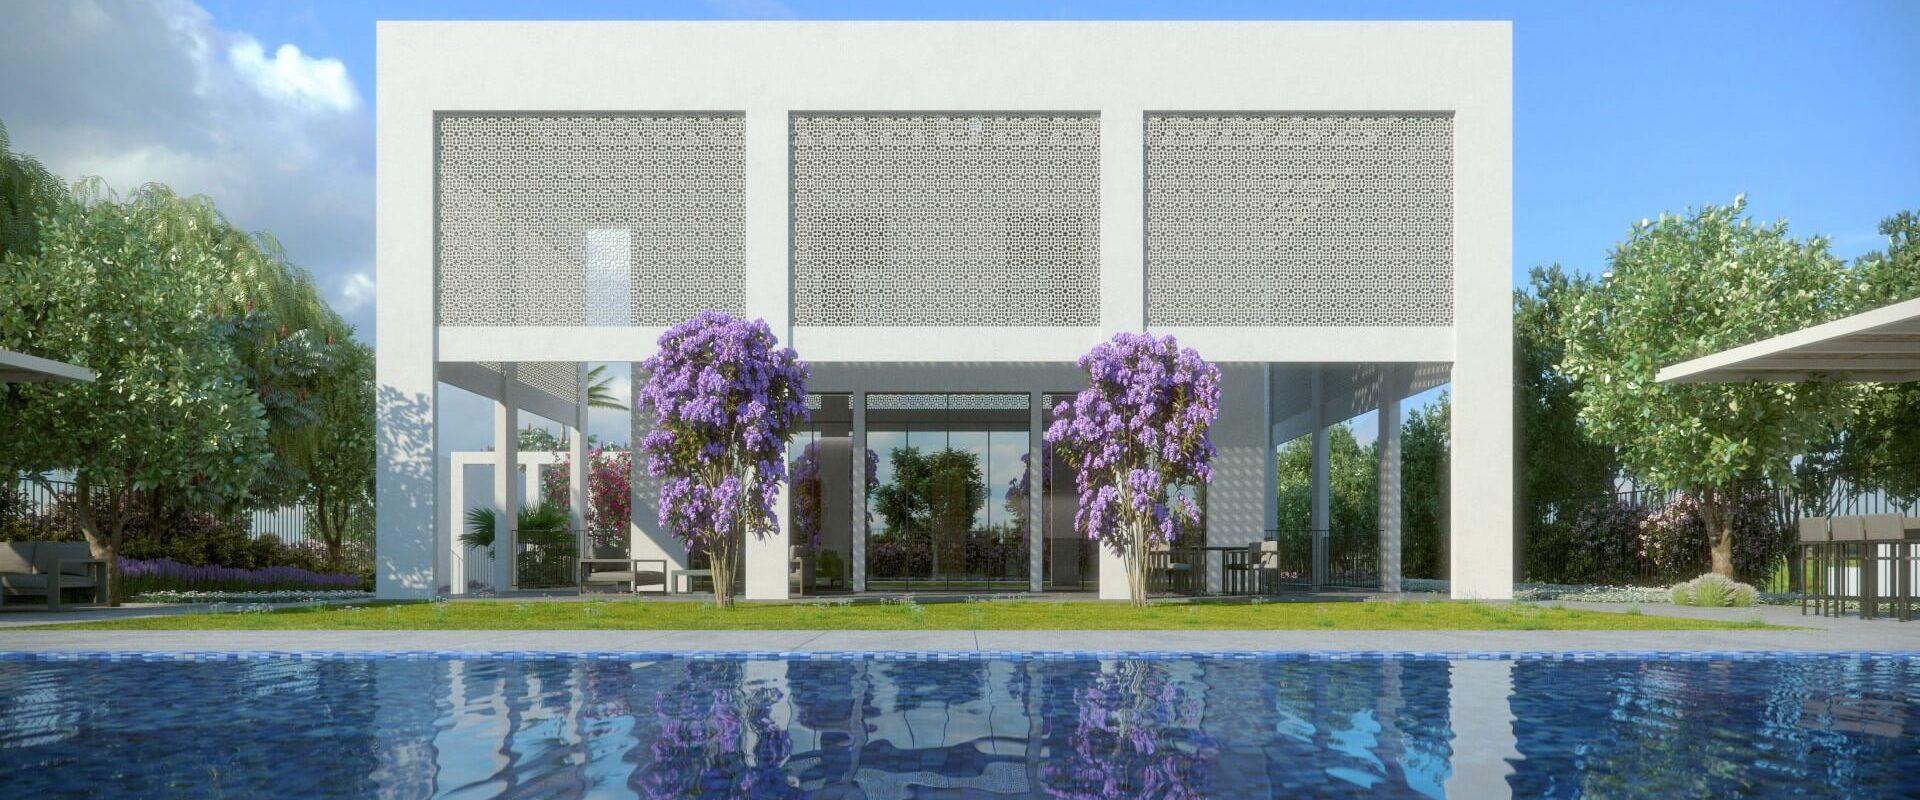 KPStudio.co.il_Private house - Avnun family (9)